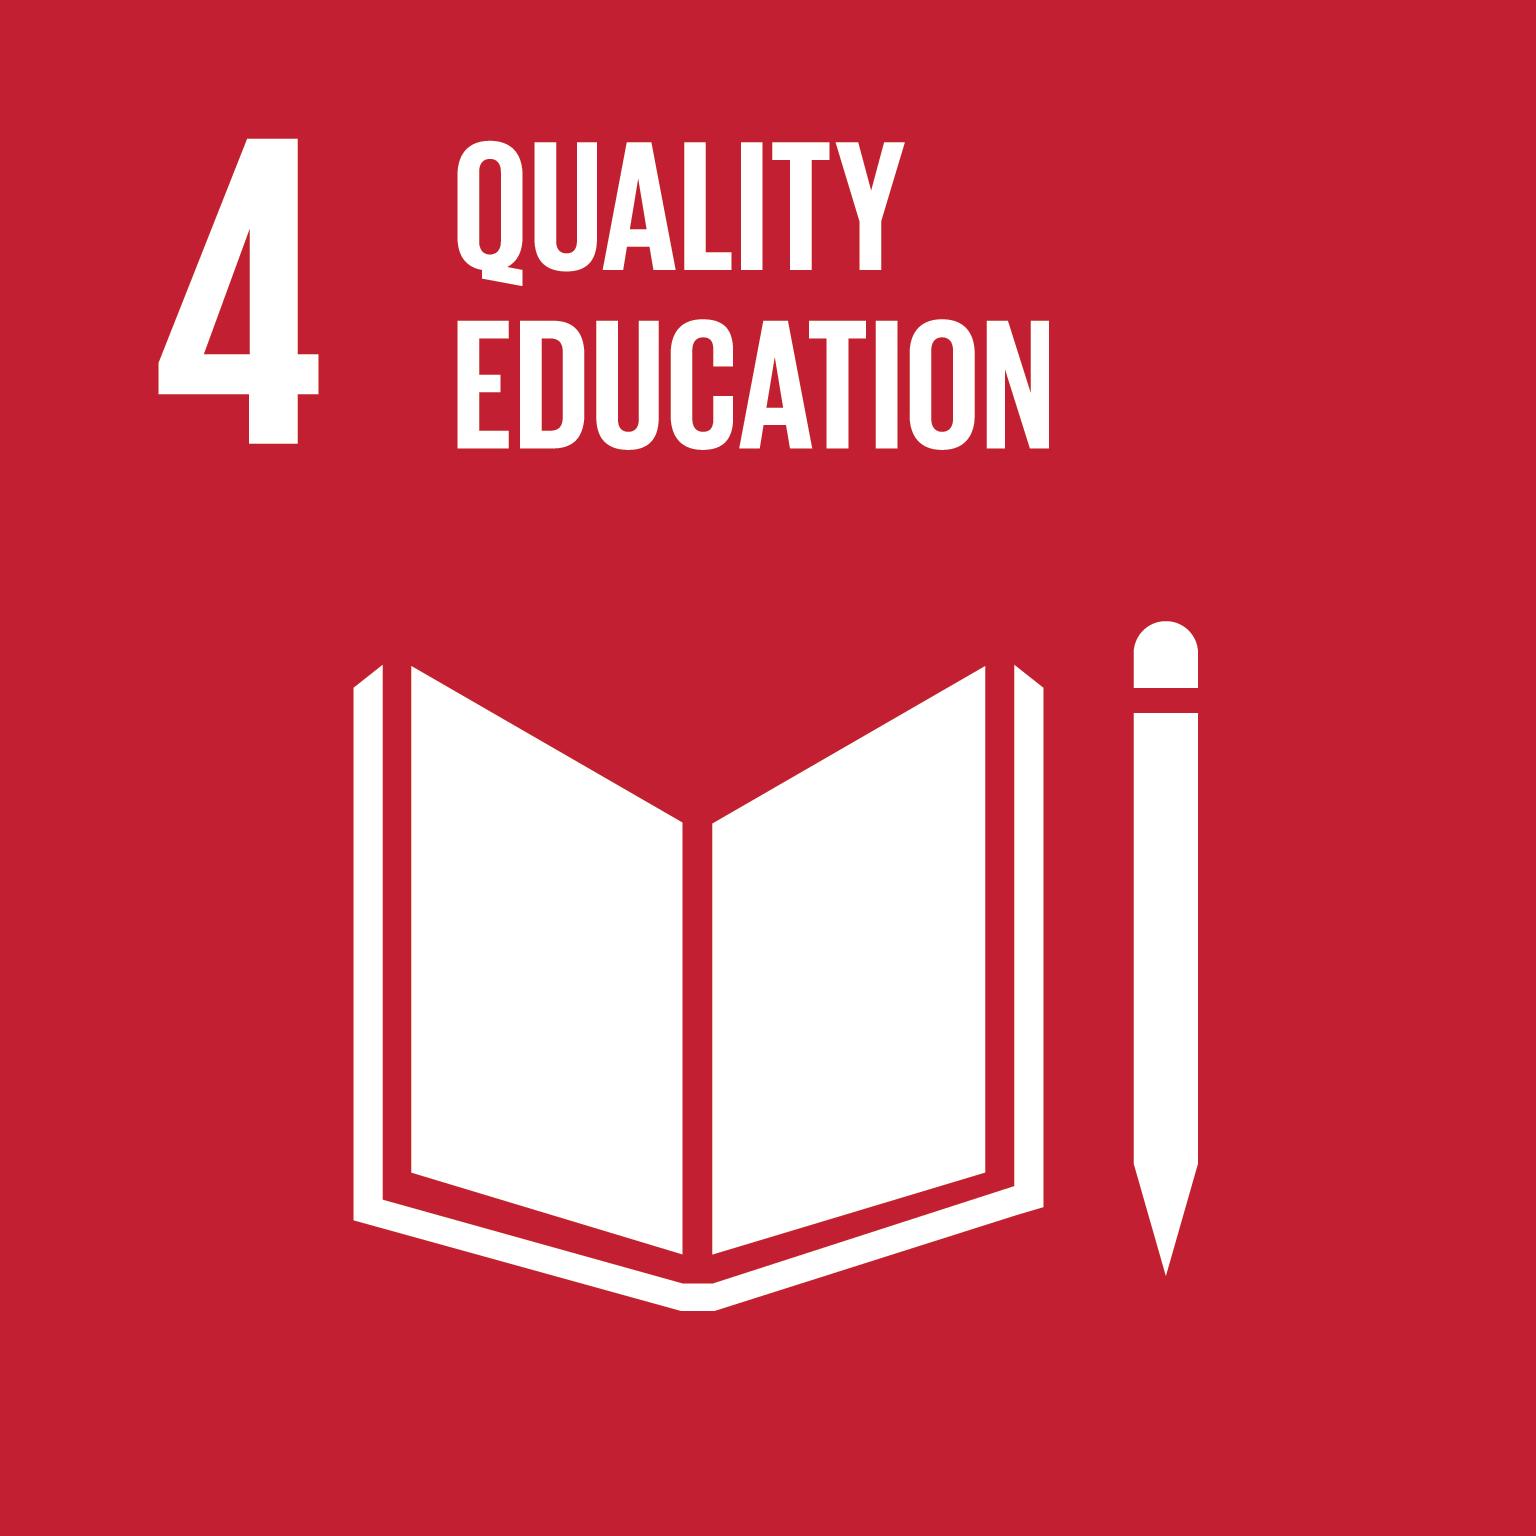 SDG 4 - Quality education